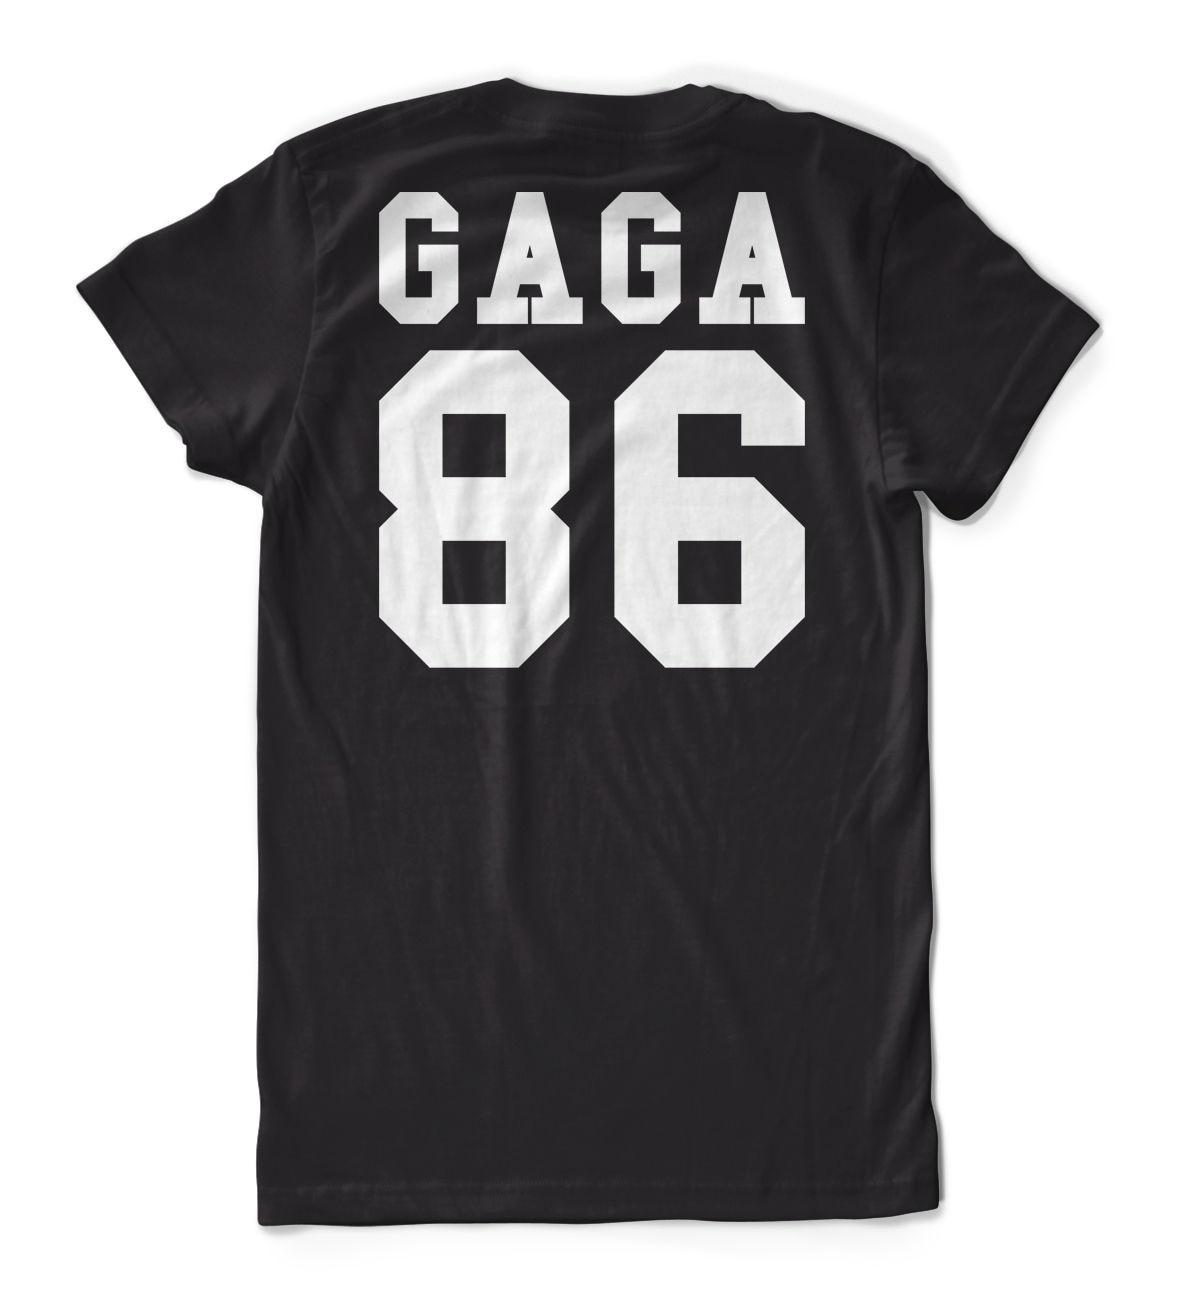 Gaga 86 T-Shirt Black Backprint Lady Pokerface Trikot Basketballer RUckennummer